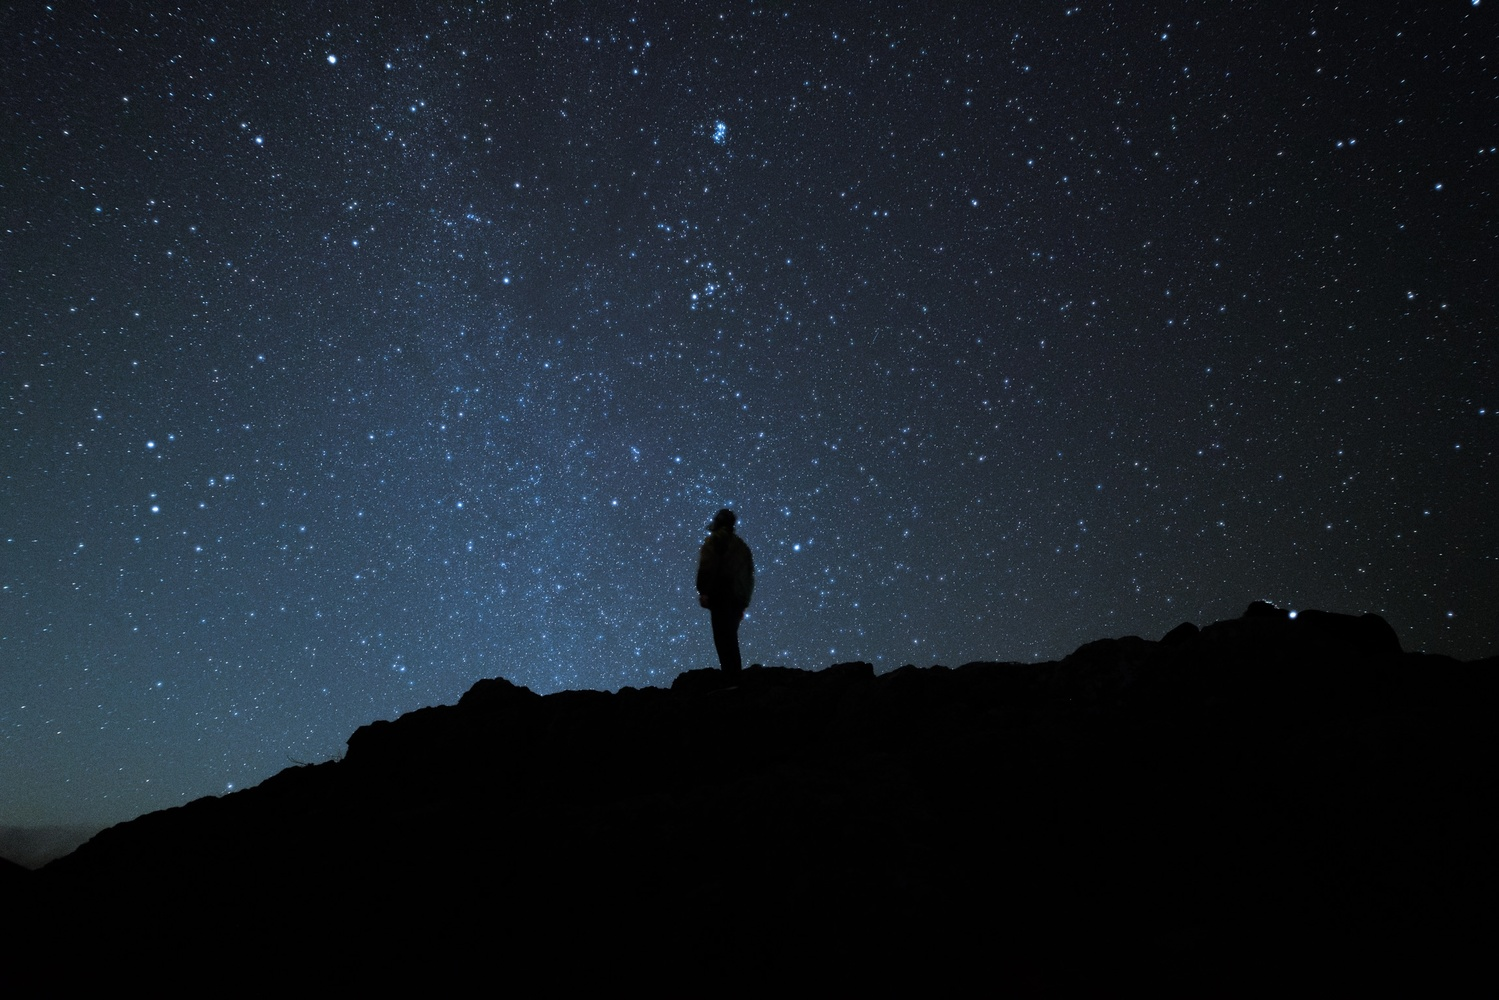 In the stars by Masataka Inada